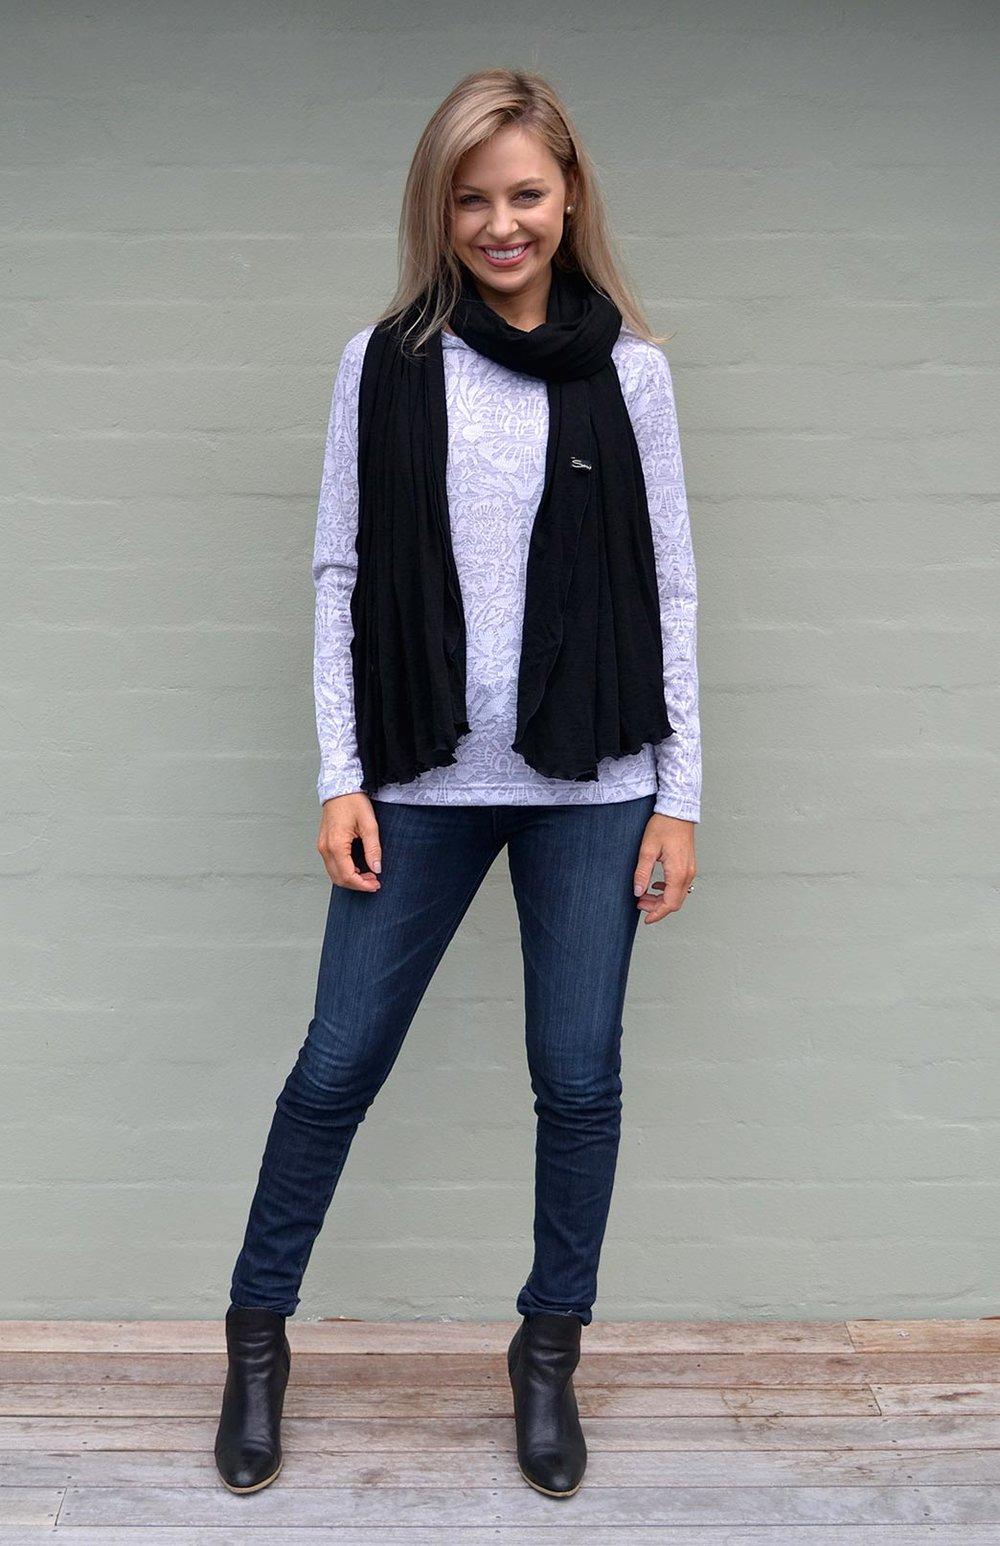 8404-wide-merino-scarf-black-new-1.jpg